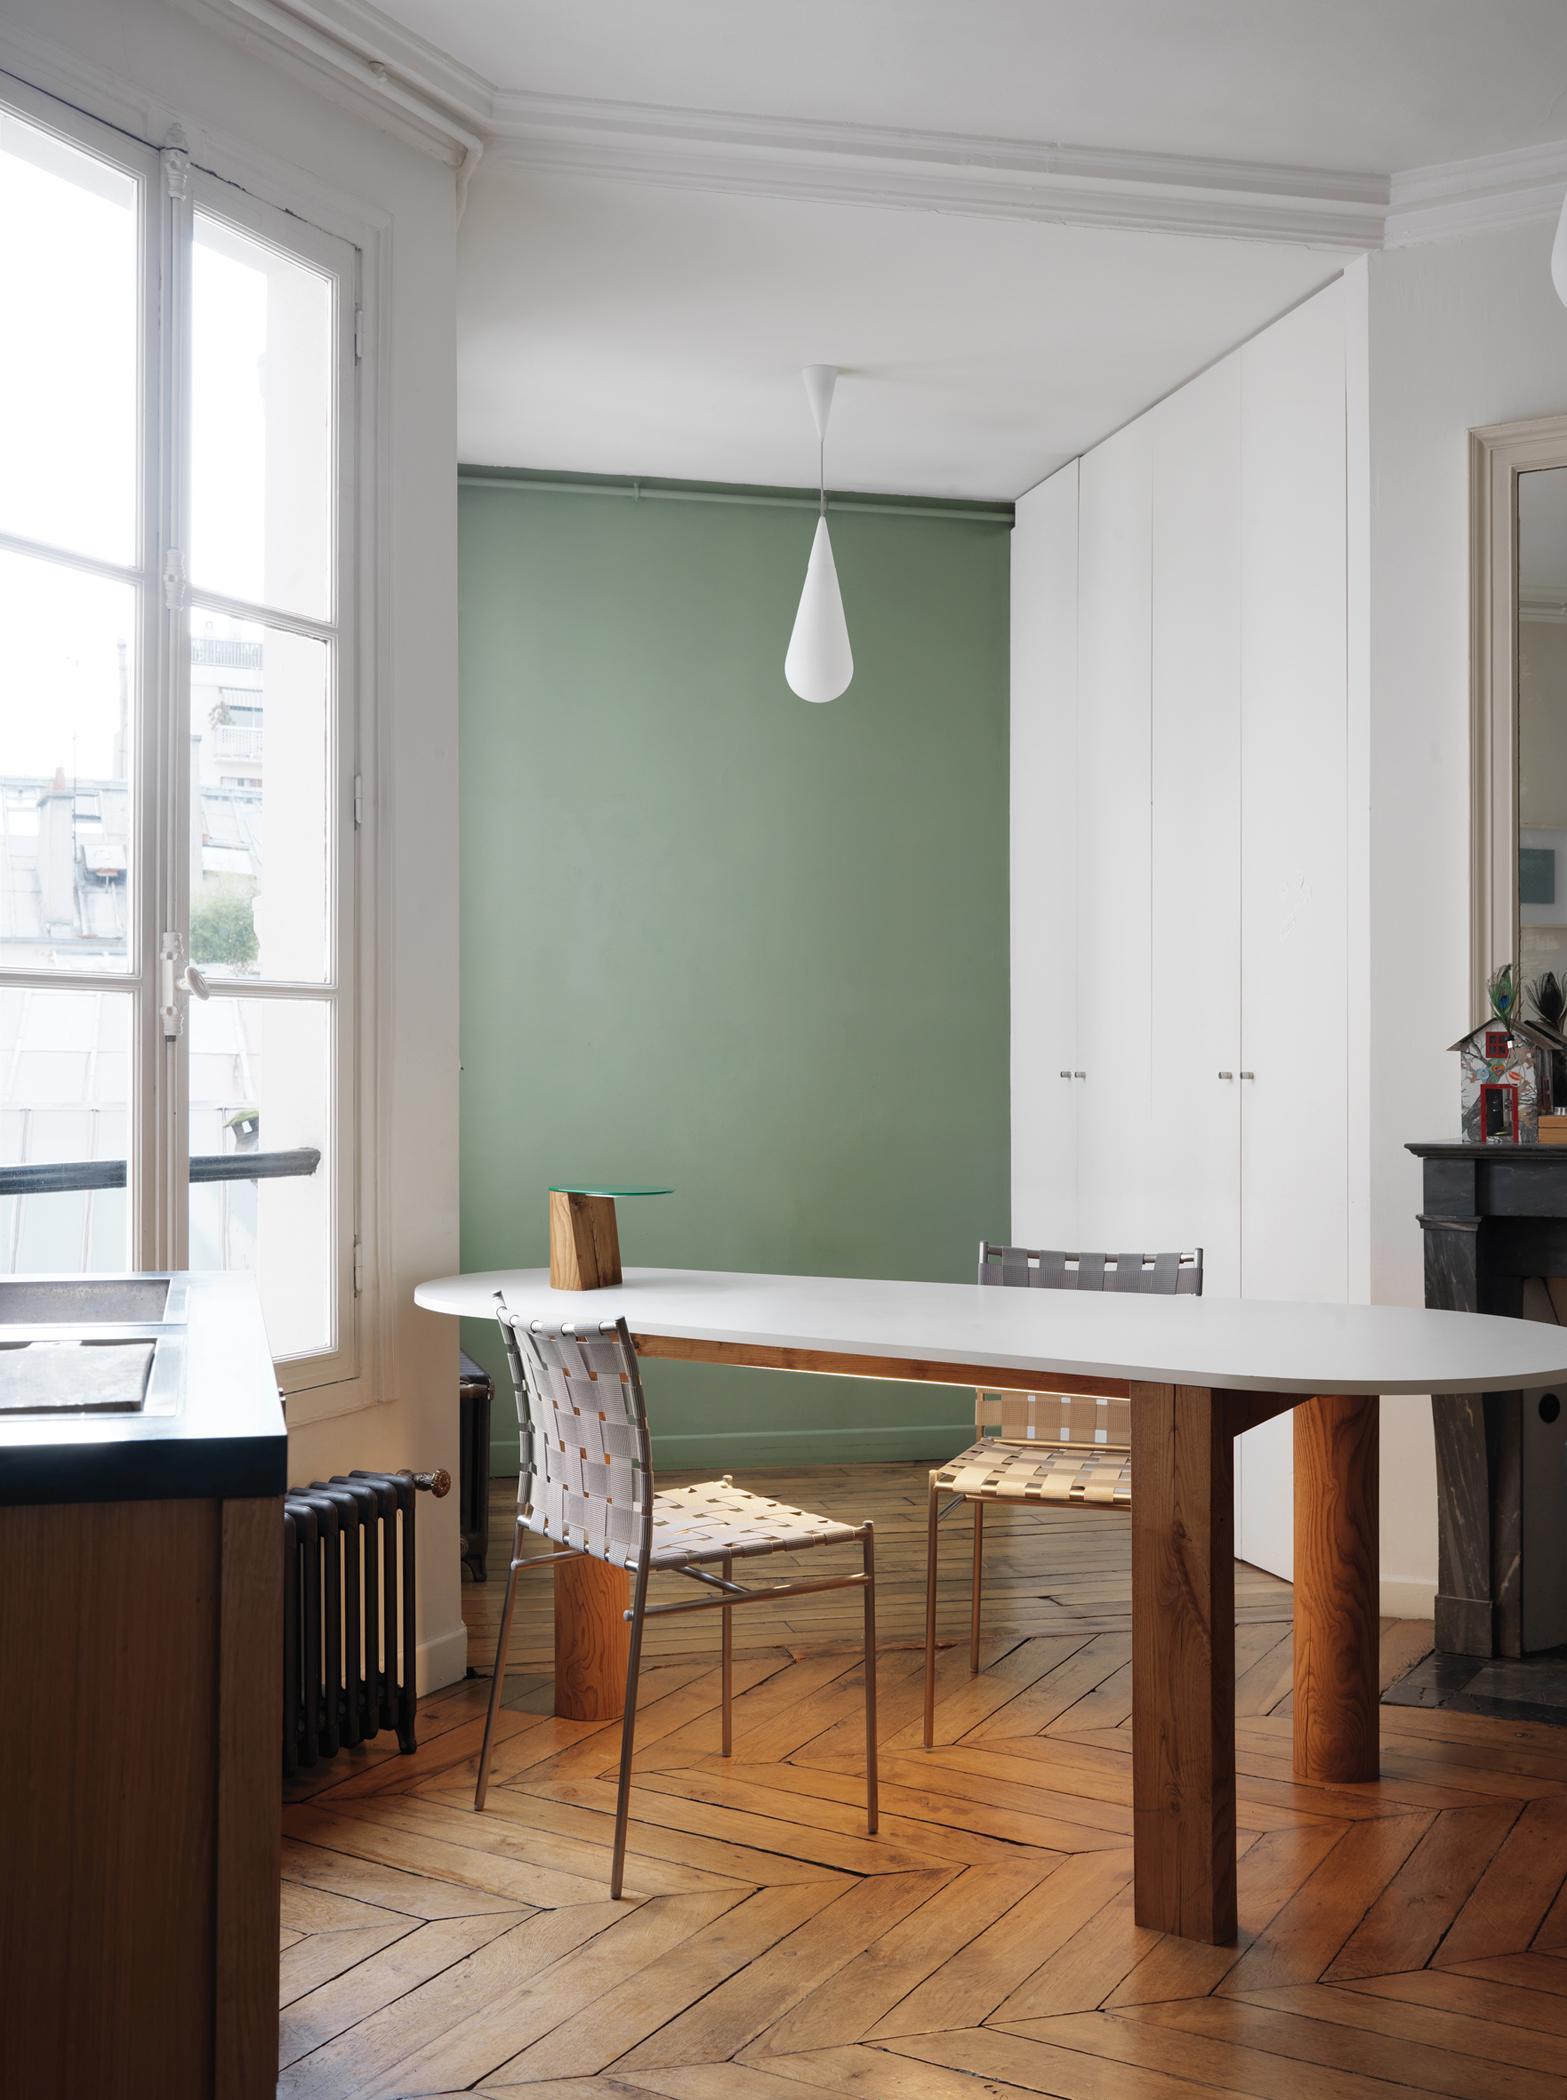 Grüne Wandfarbe • Bilder & Ideen • COUCH